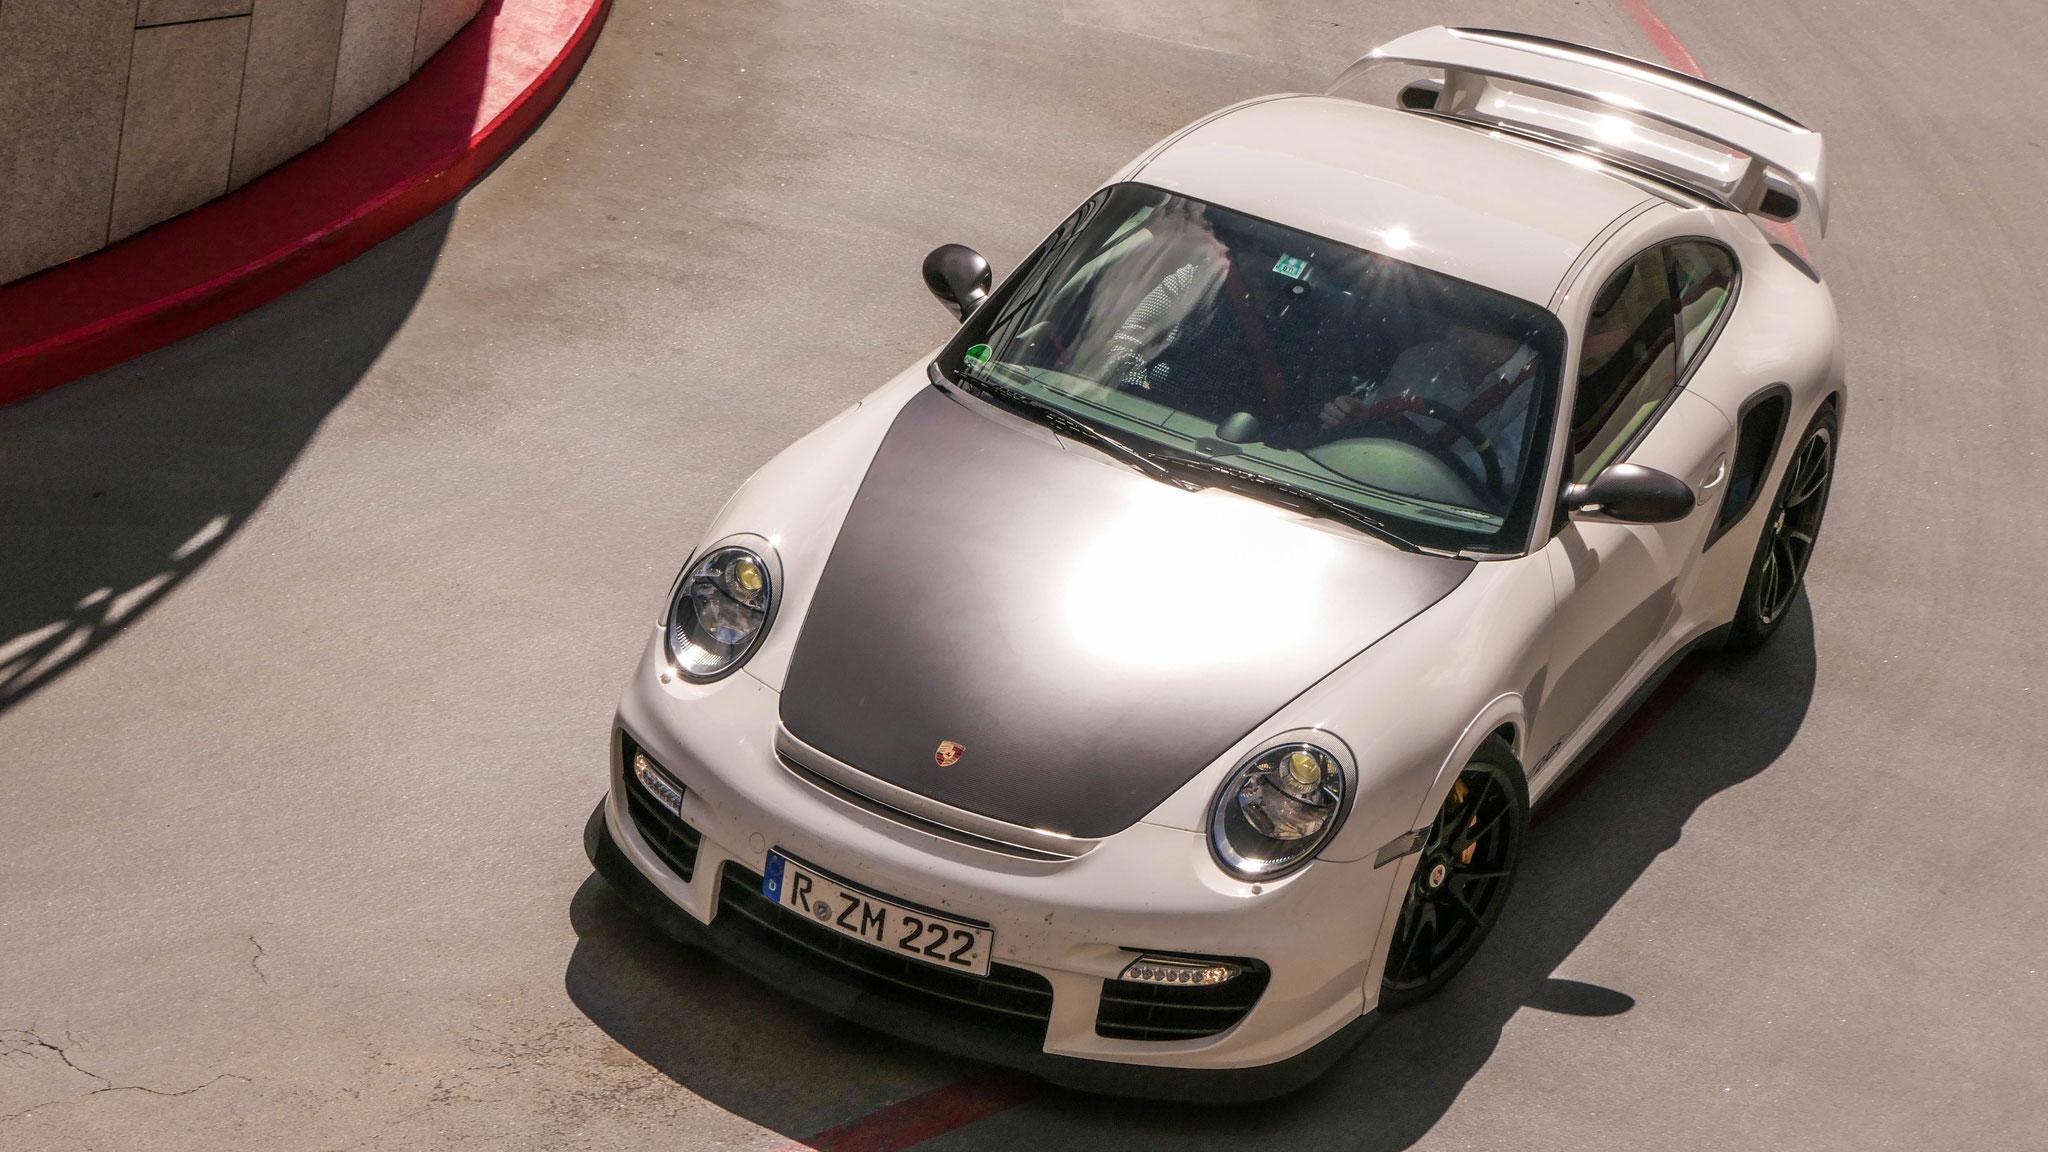 Porsche 911 997 GT2 RS - R-ZM-222